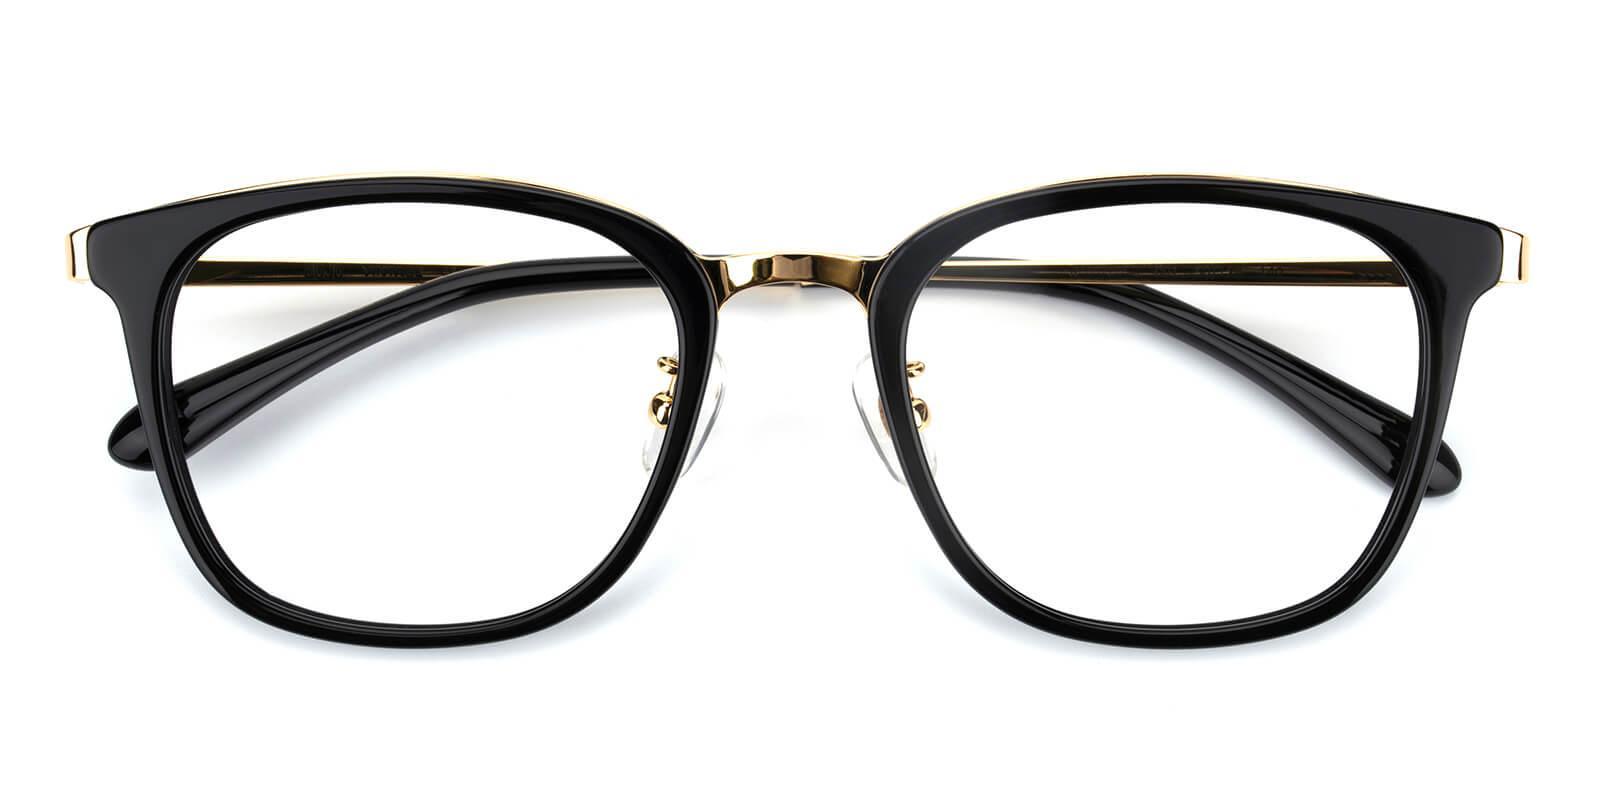 Keronito-Black-Square-Metal-Eyeglasses-detail